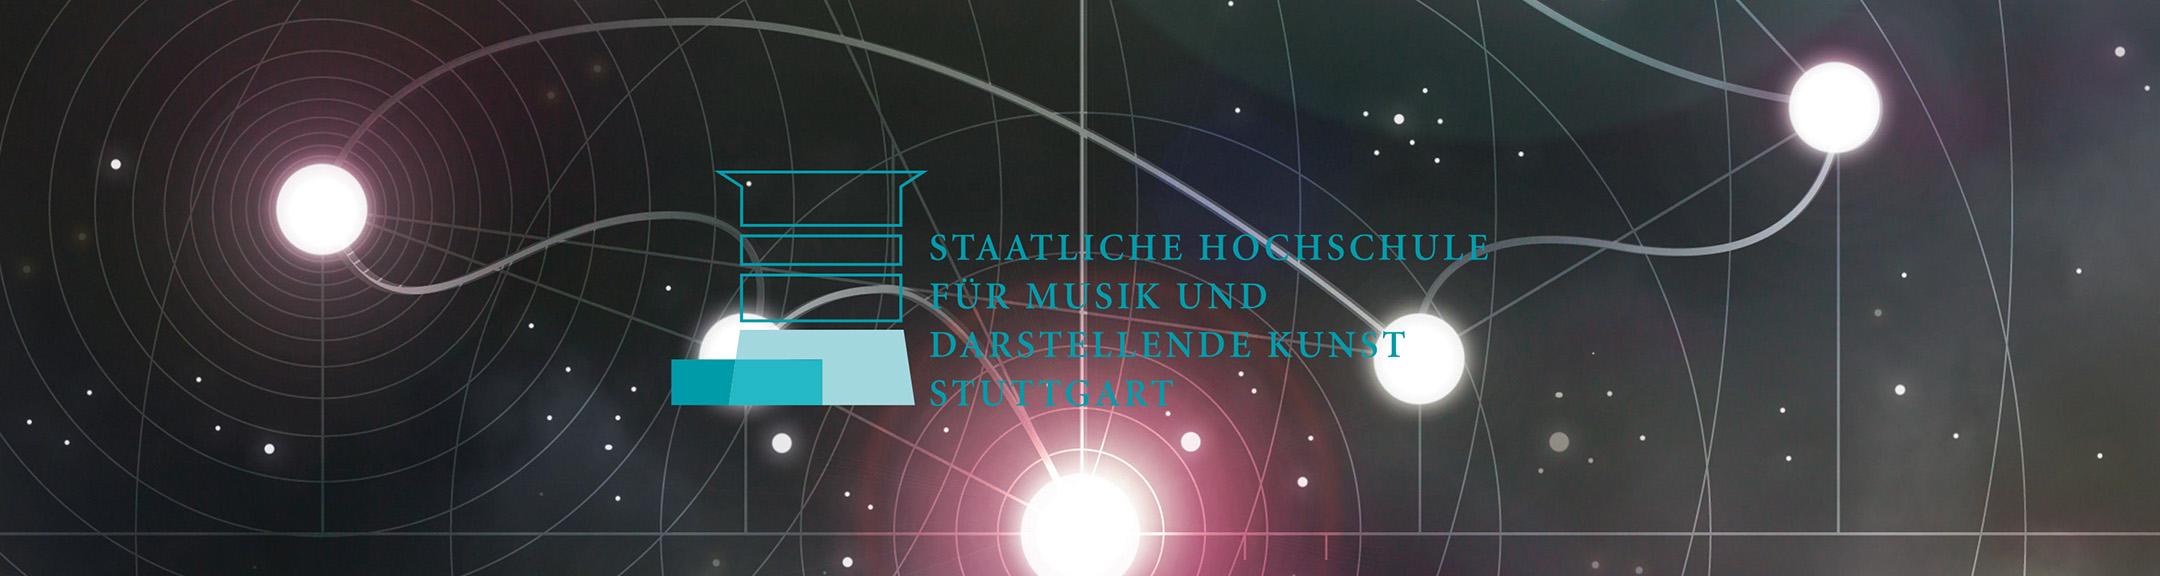 Hochschule_Musik_Darstellende_Kunst_Start_by_majormajor